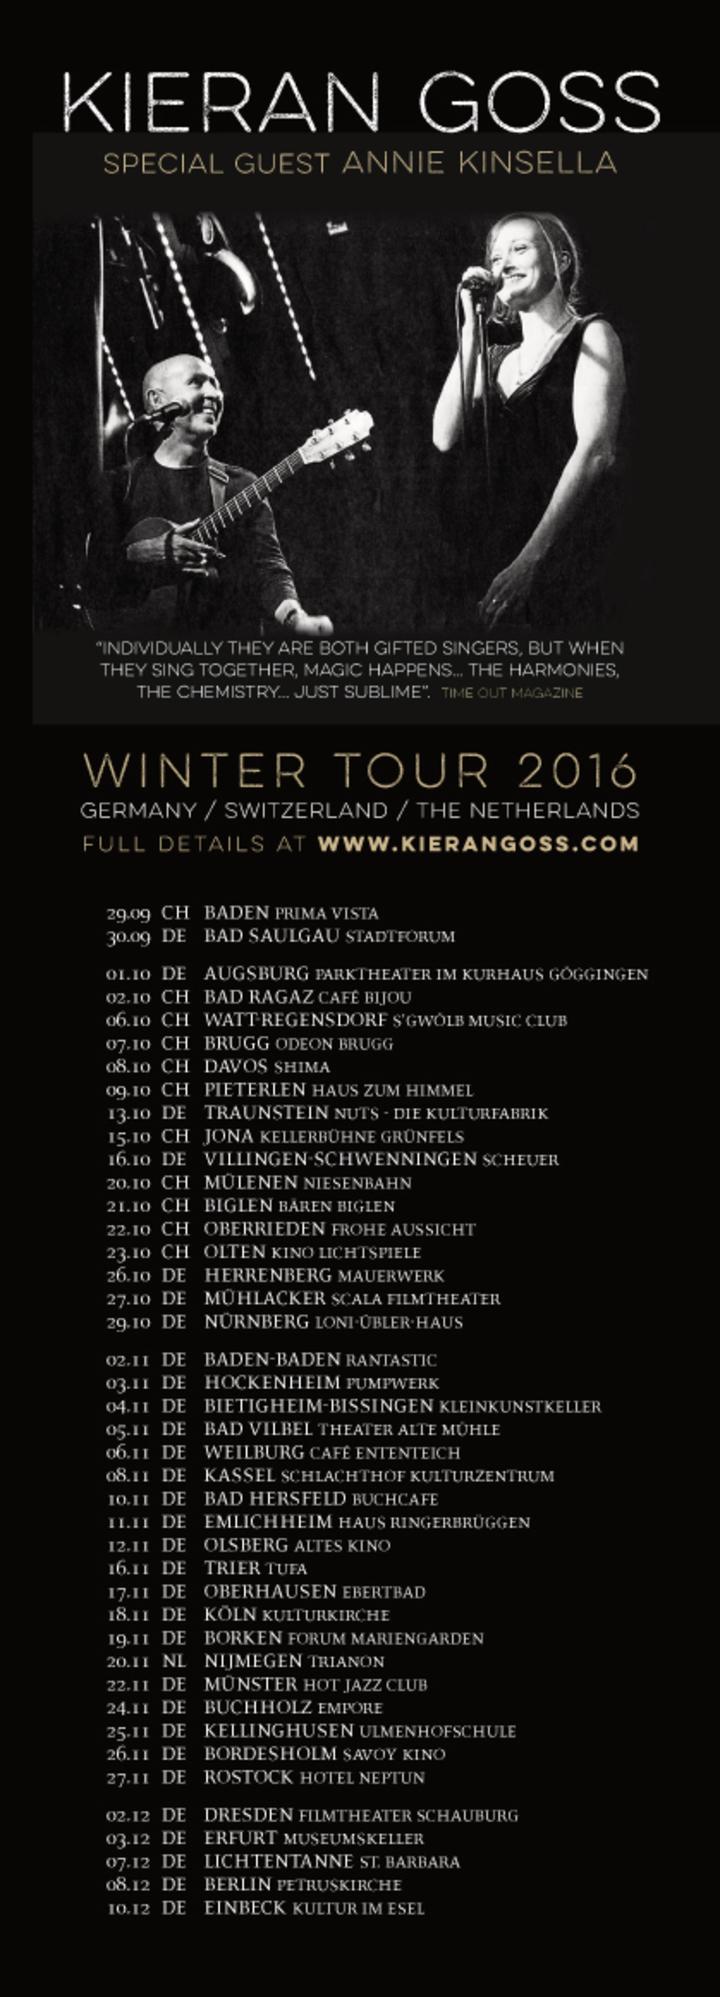 Kieran Goss @ GERMANY | EINBECK | Kultur im Esel - Einbeck, Germany